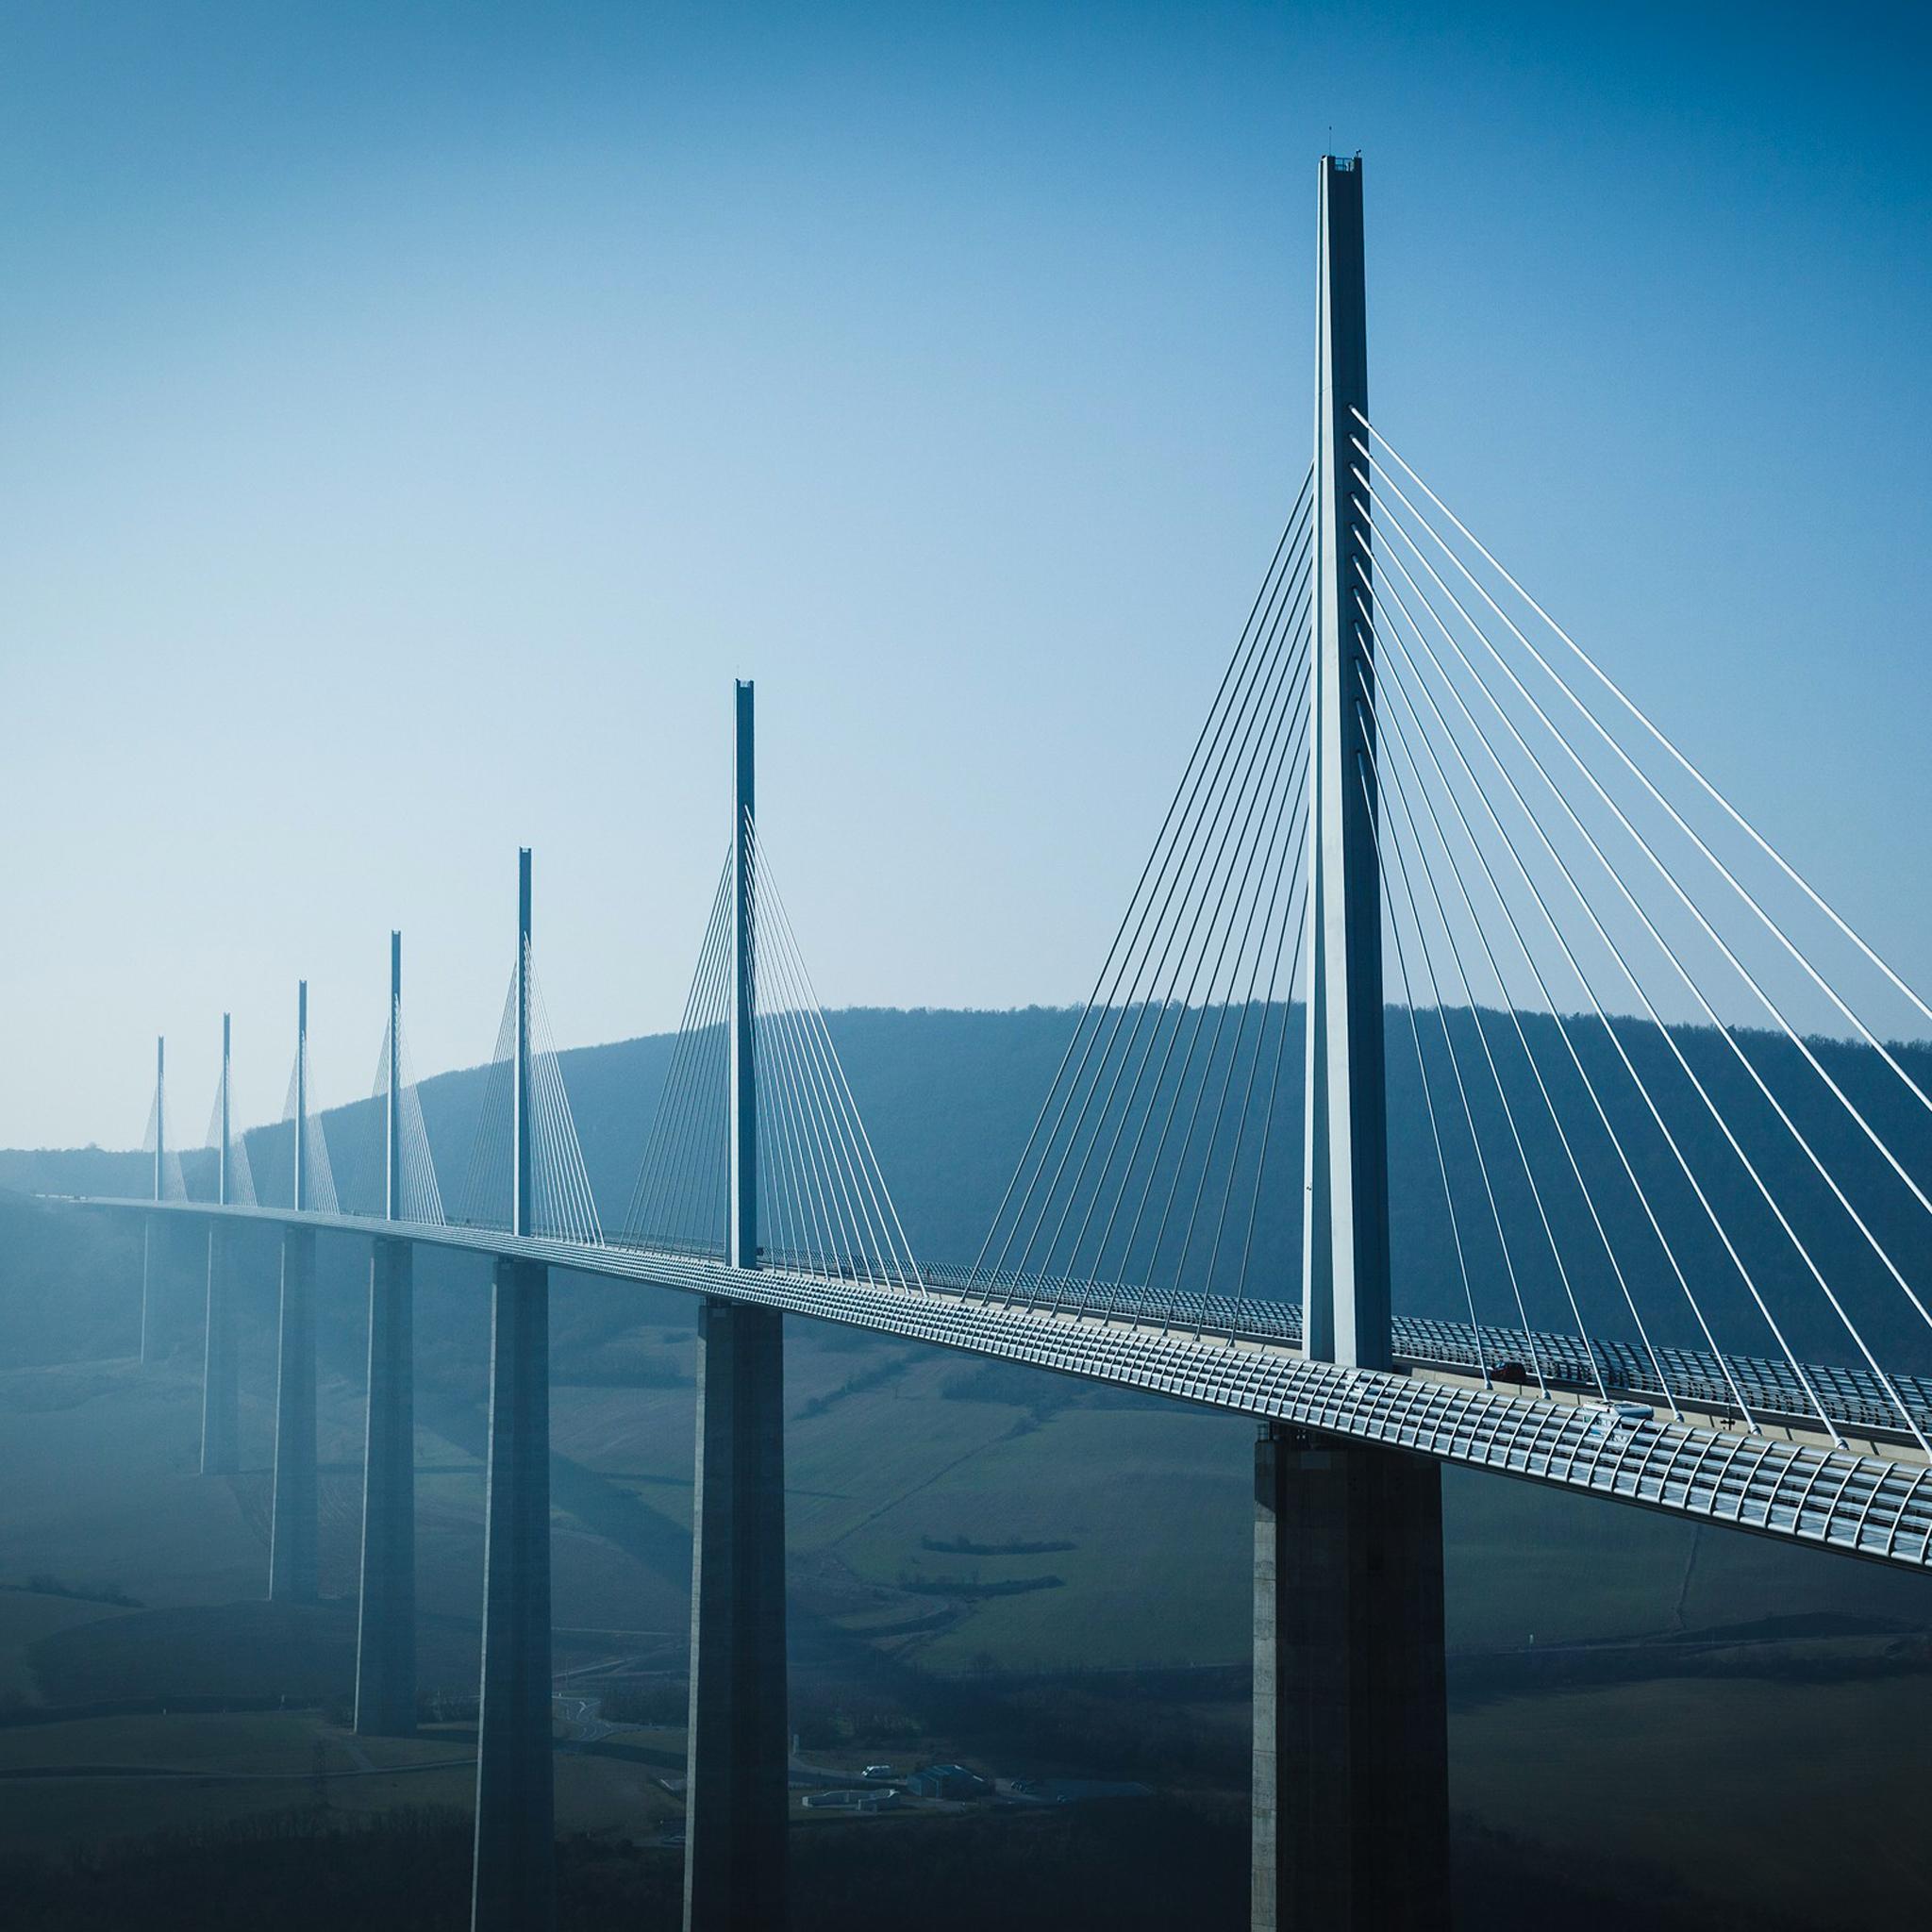 Viaduc de Millau 3Wallpapers iPad Viaduc de Millau   iPad